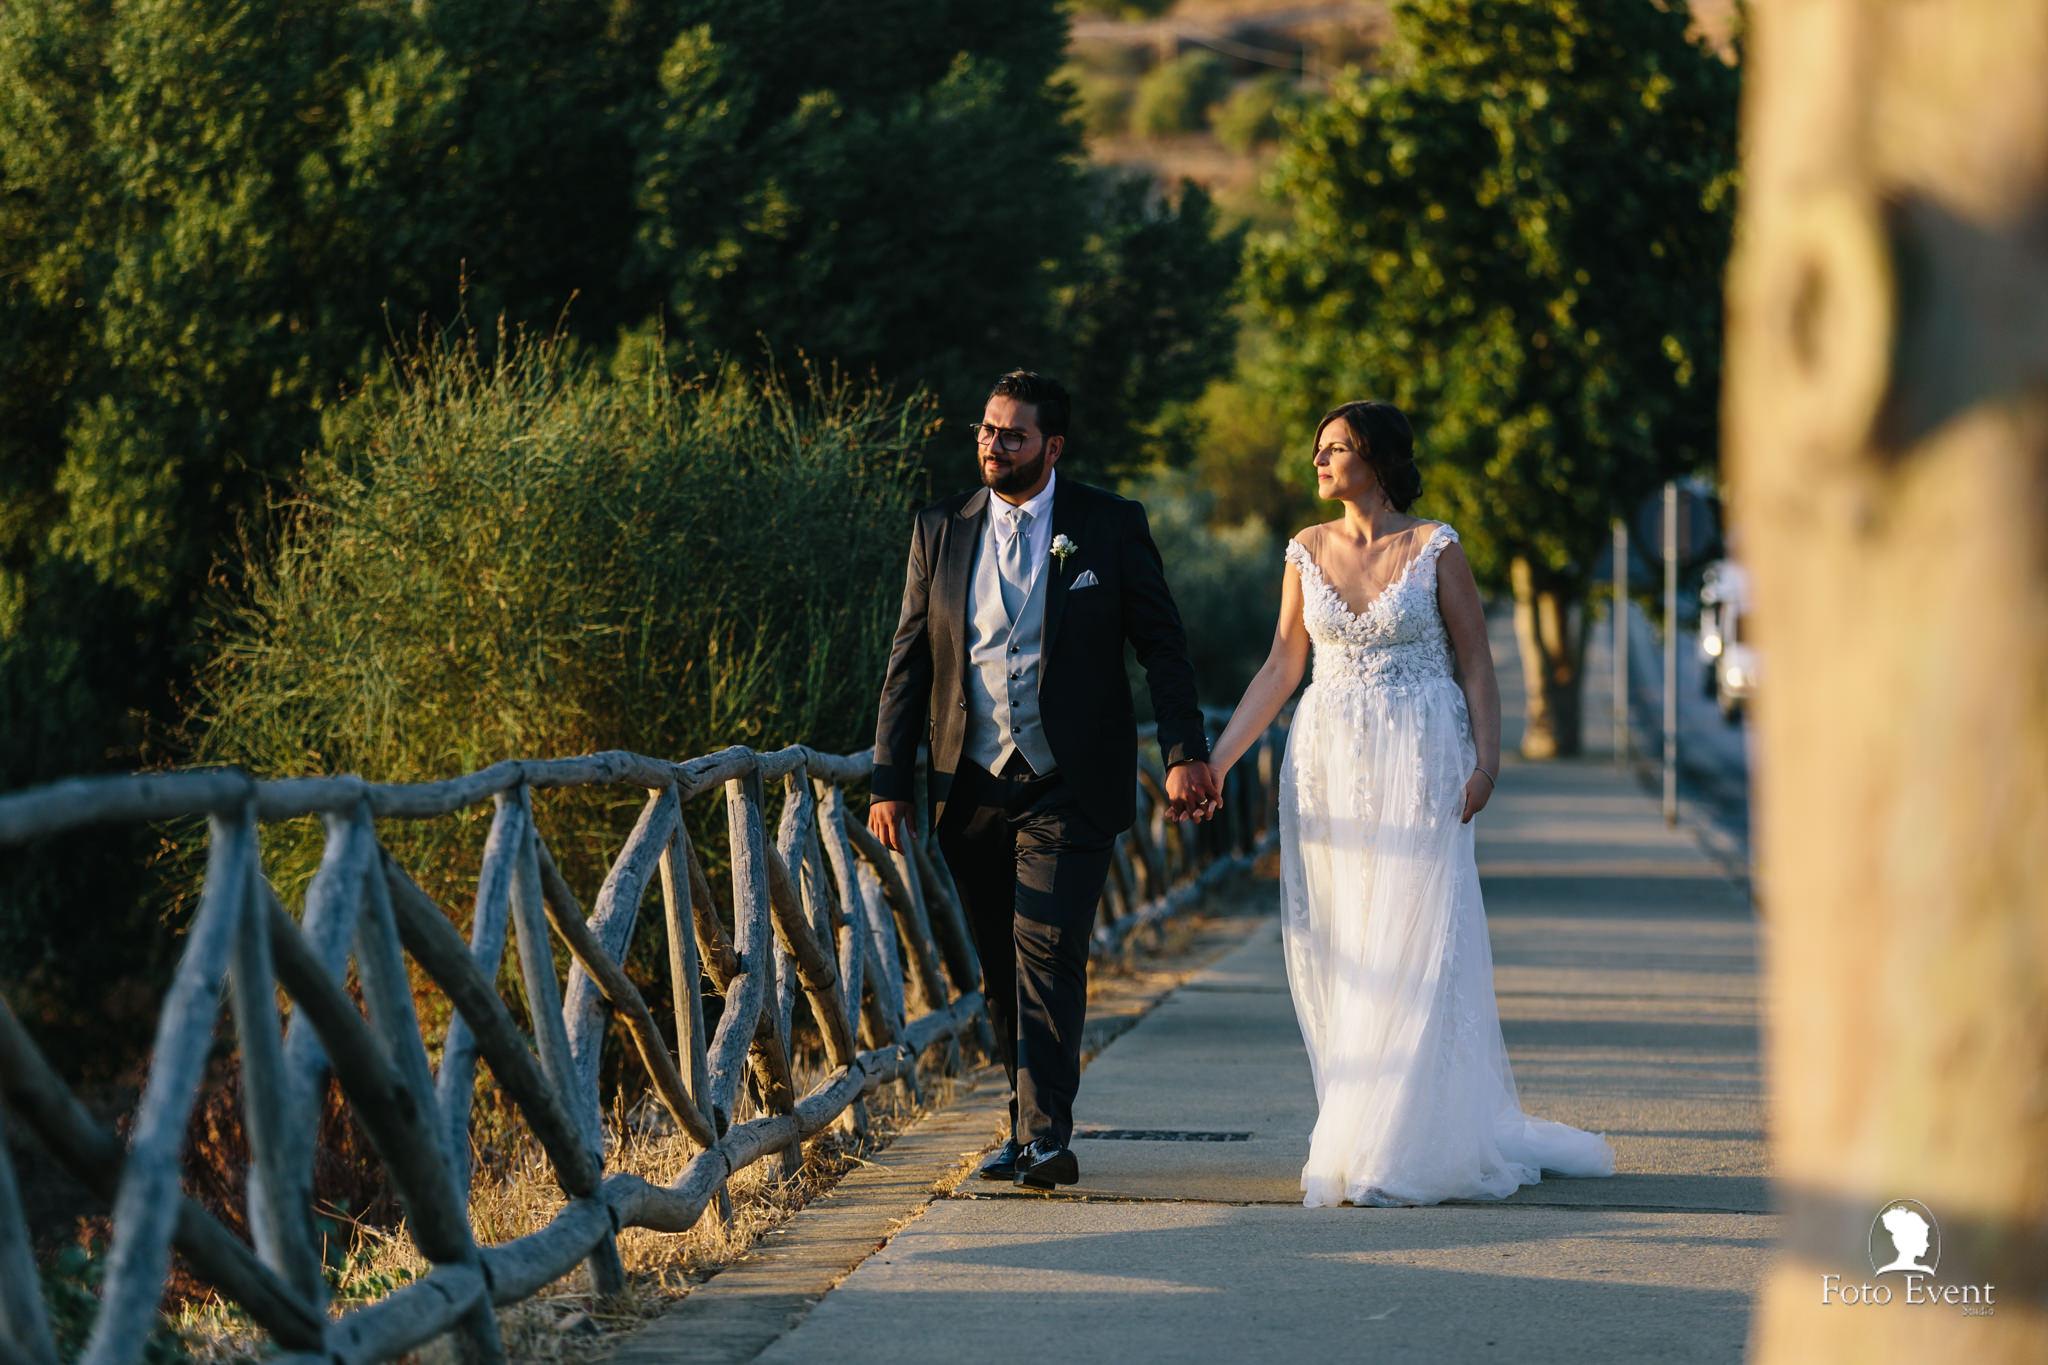 031-2019-09-09-Matrimonio-Dorotea-e-Alberto-Iemmolo-zoom-501